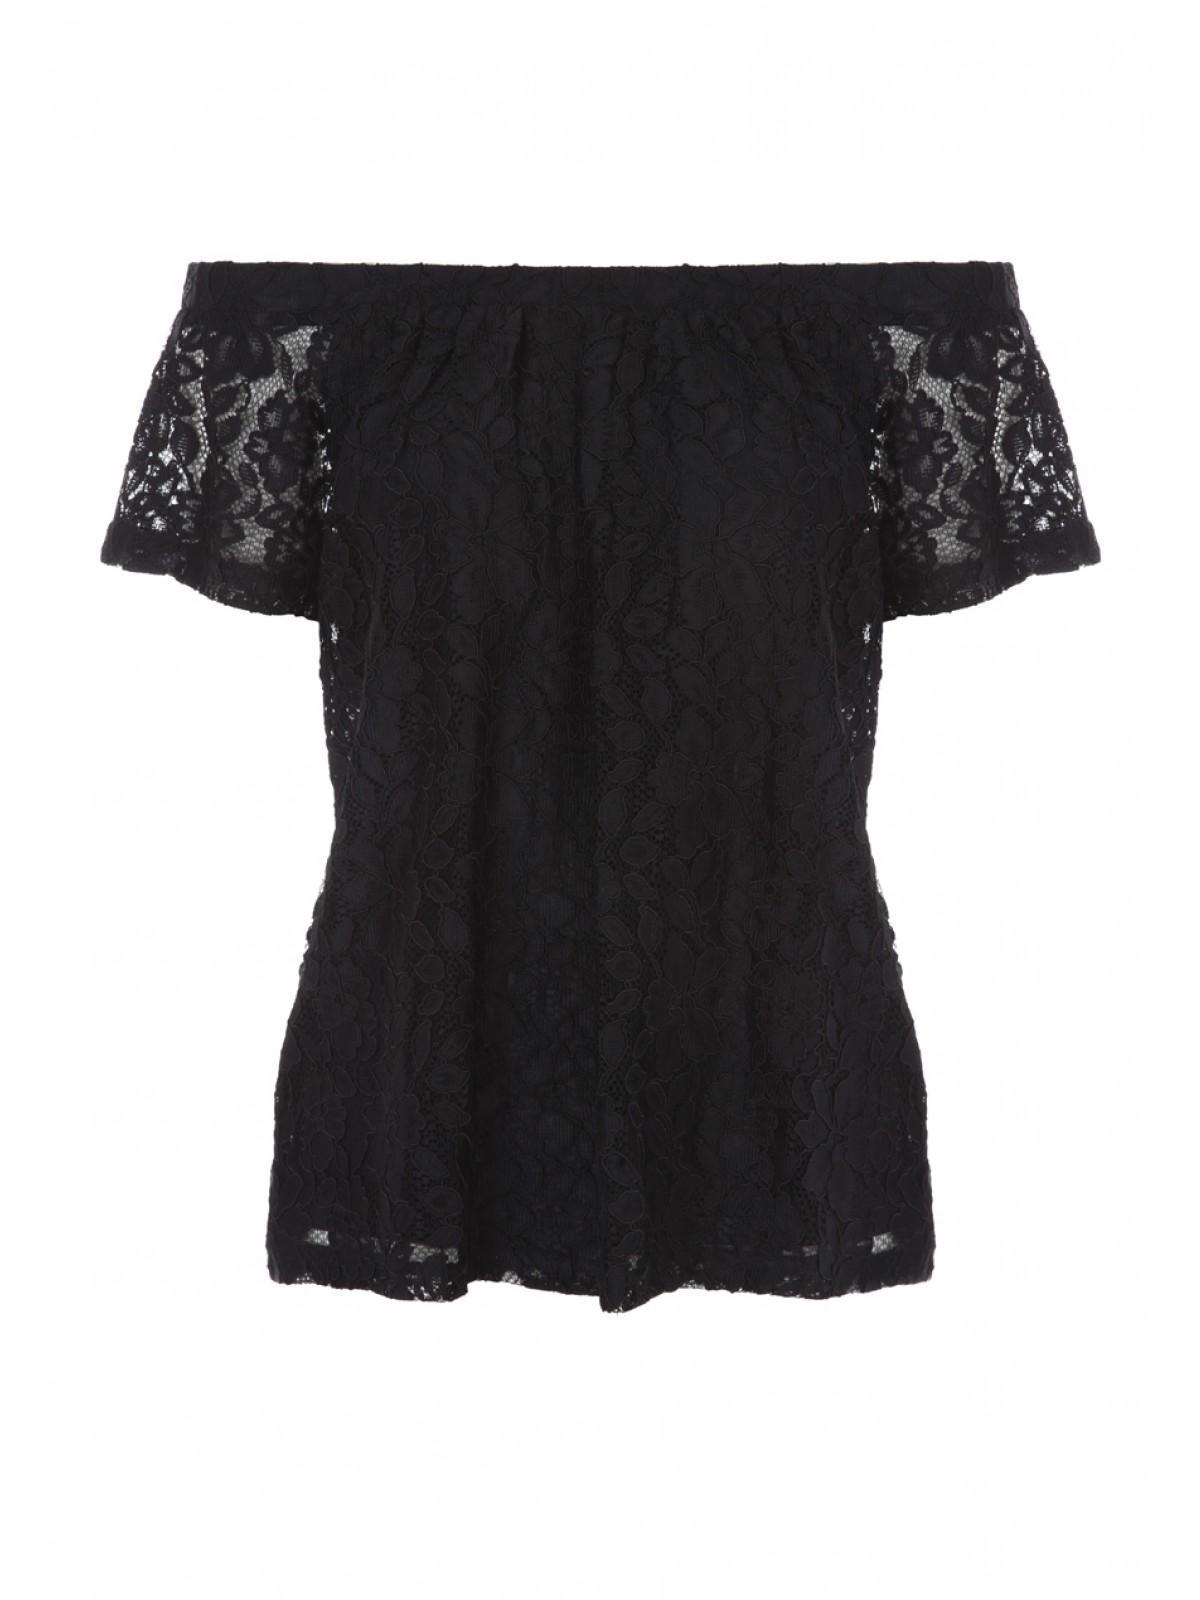 cf80d8f672d18 Womens Black Lace Bardot Top